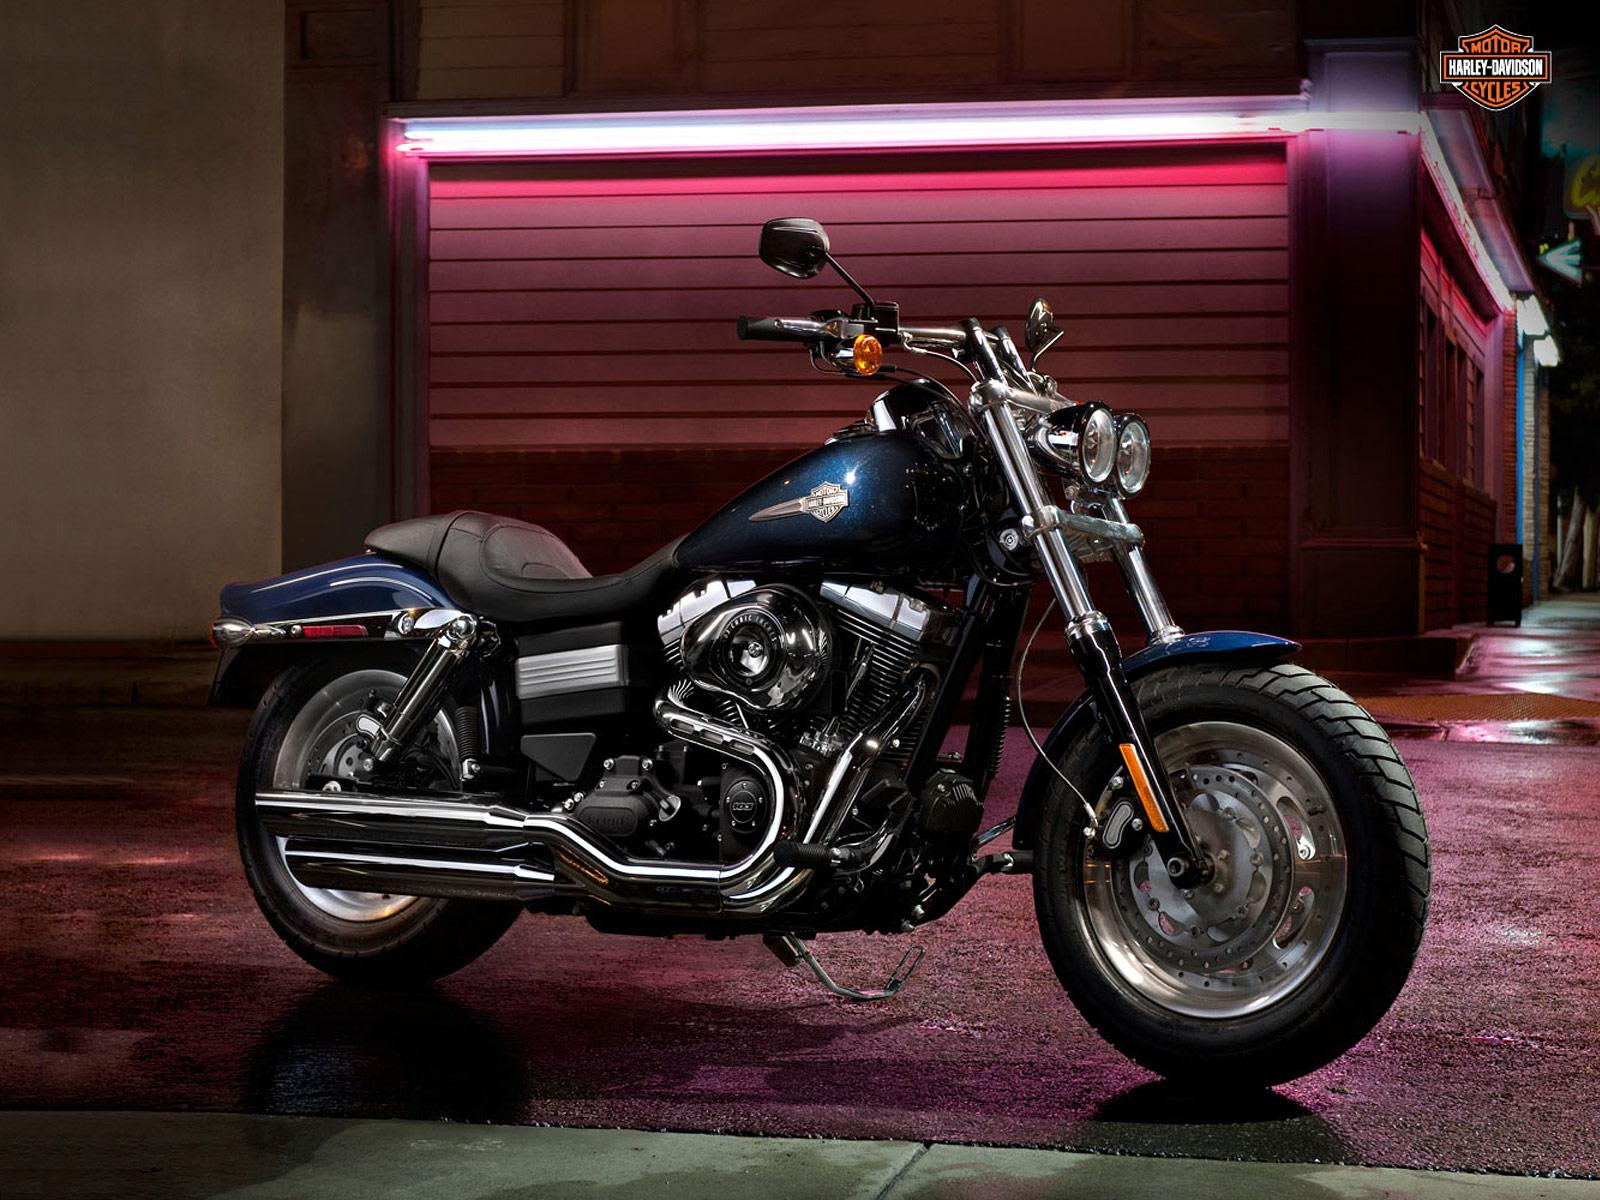 2012 Harley-Davidson FXDF Dyna Fat Bob | HD pictures